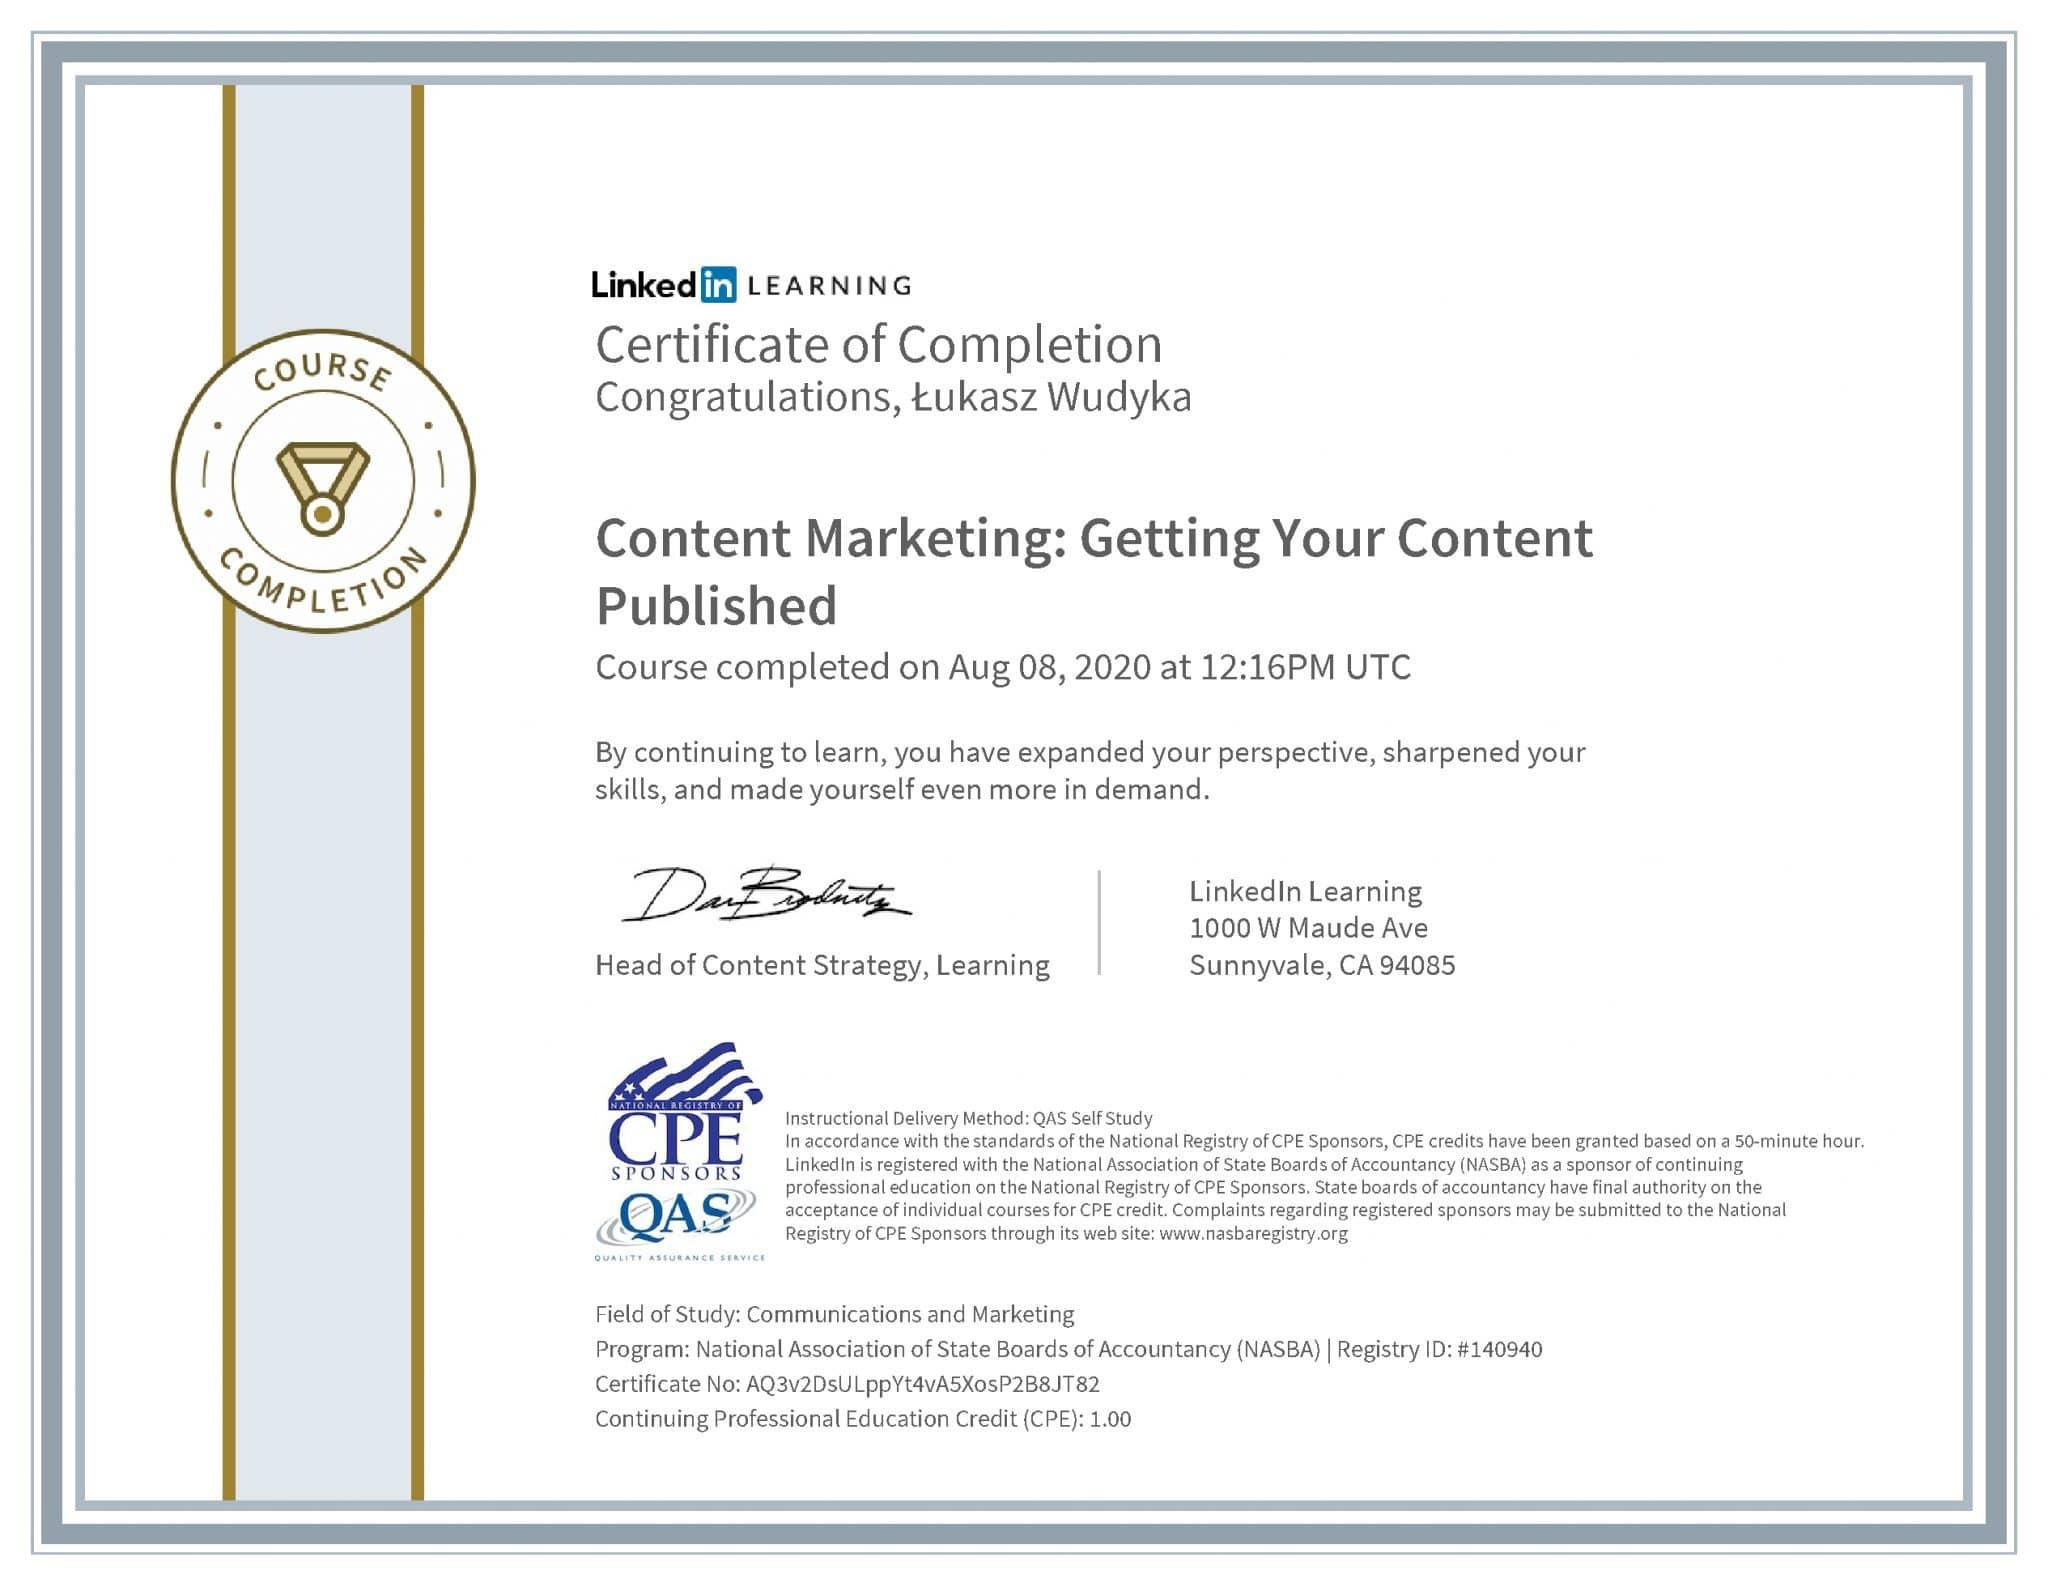 Łukasz Wudyka certyfikat LinkedIn Content Marketing: Getting Your Content Published NASBA